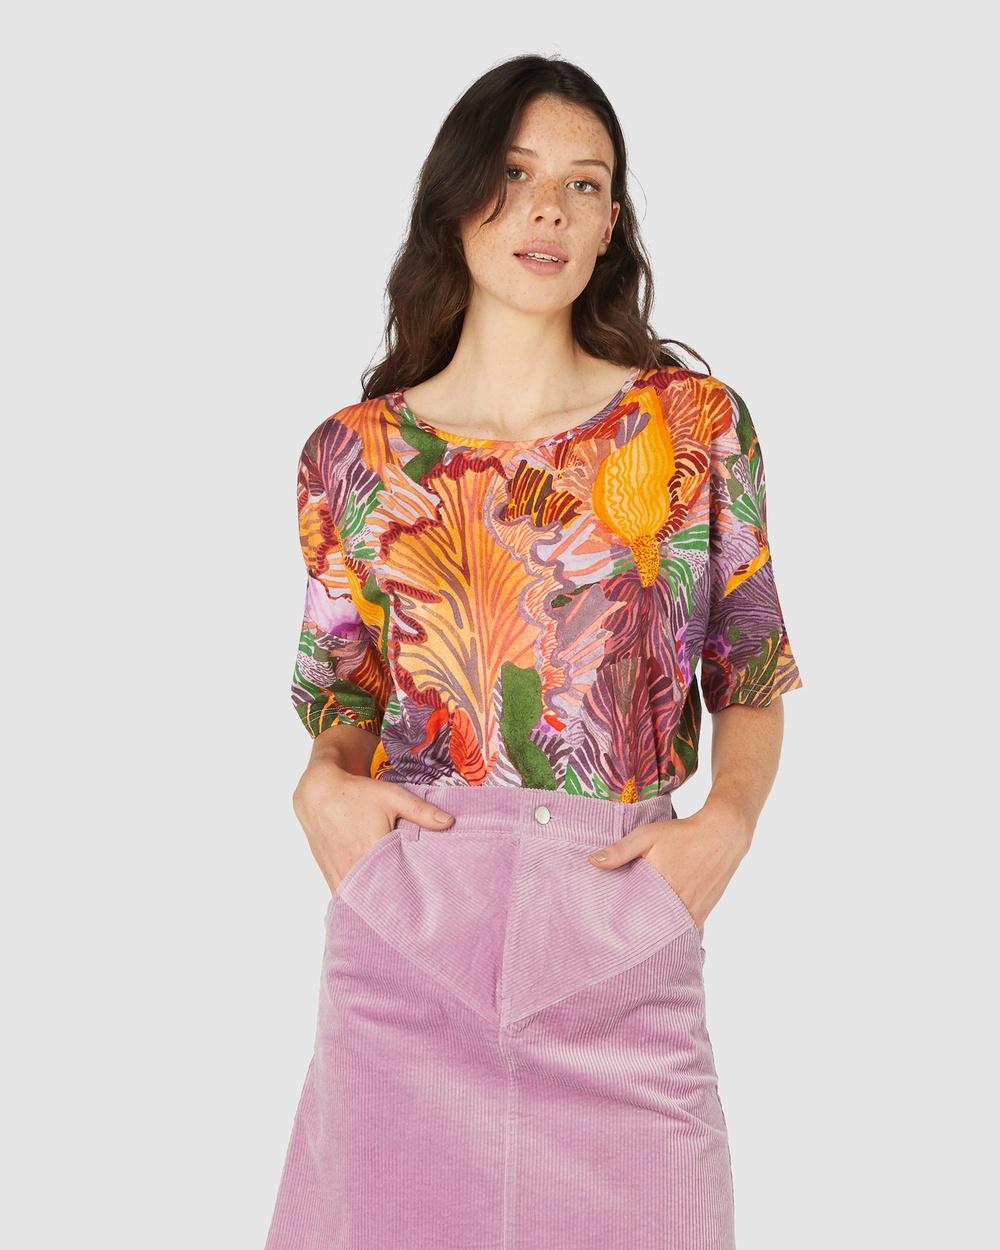 Gorman - Iris Veins Tee - T-Shirts & Singlets (Multi) Iris Veins Tee